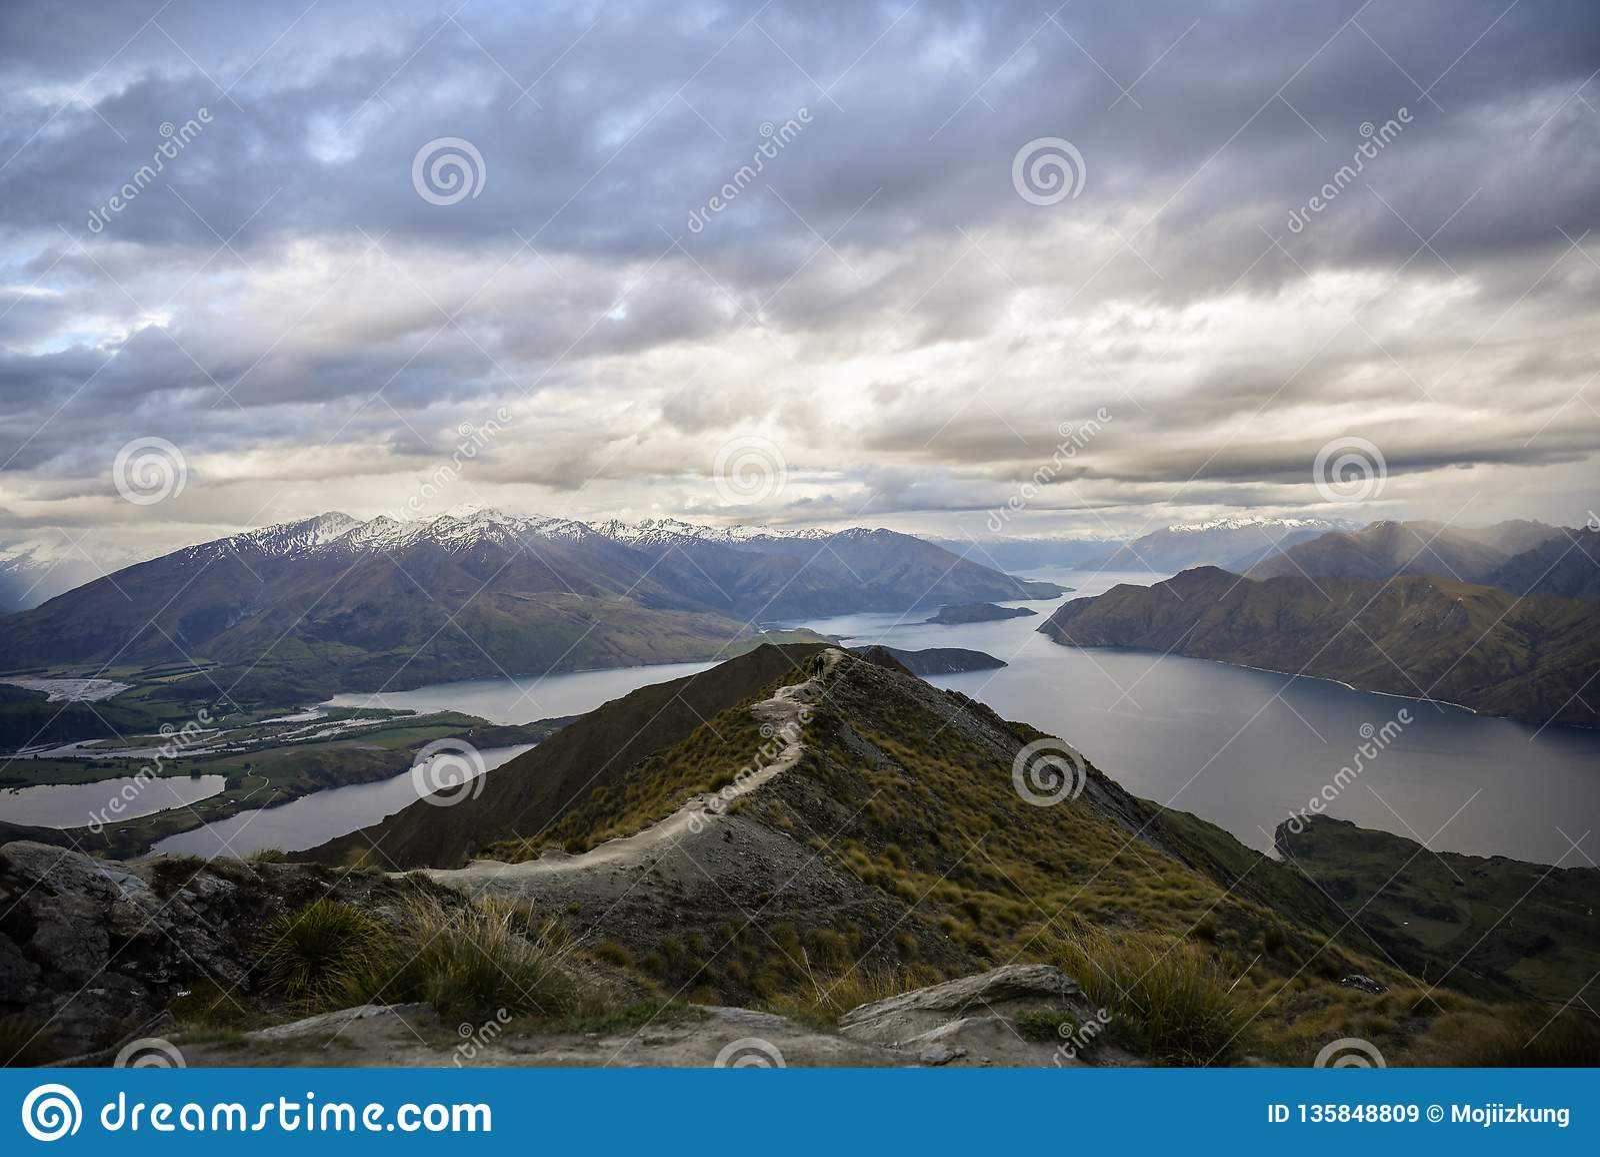 Roys peak new Zealand mountain